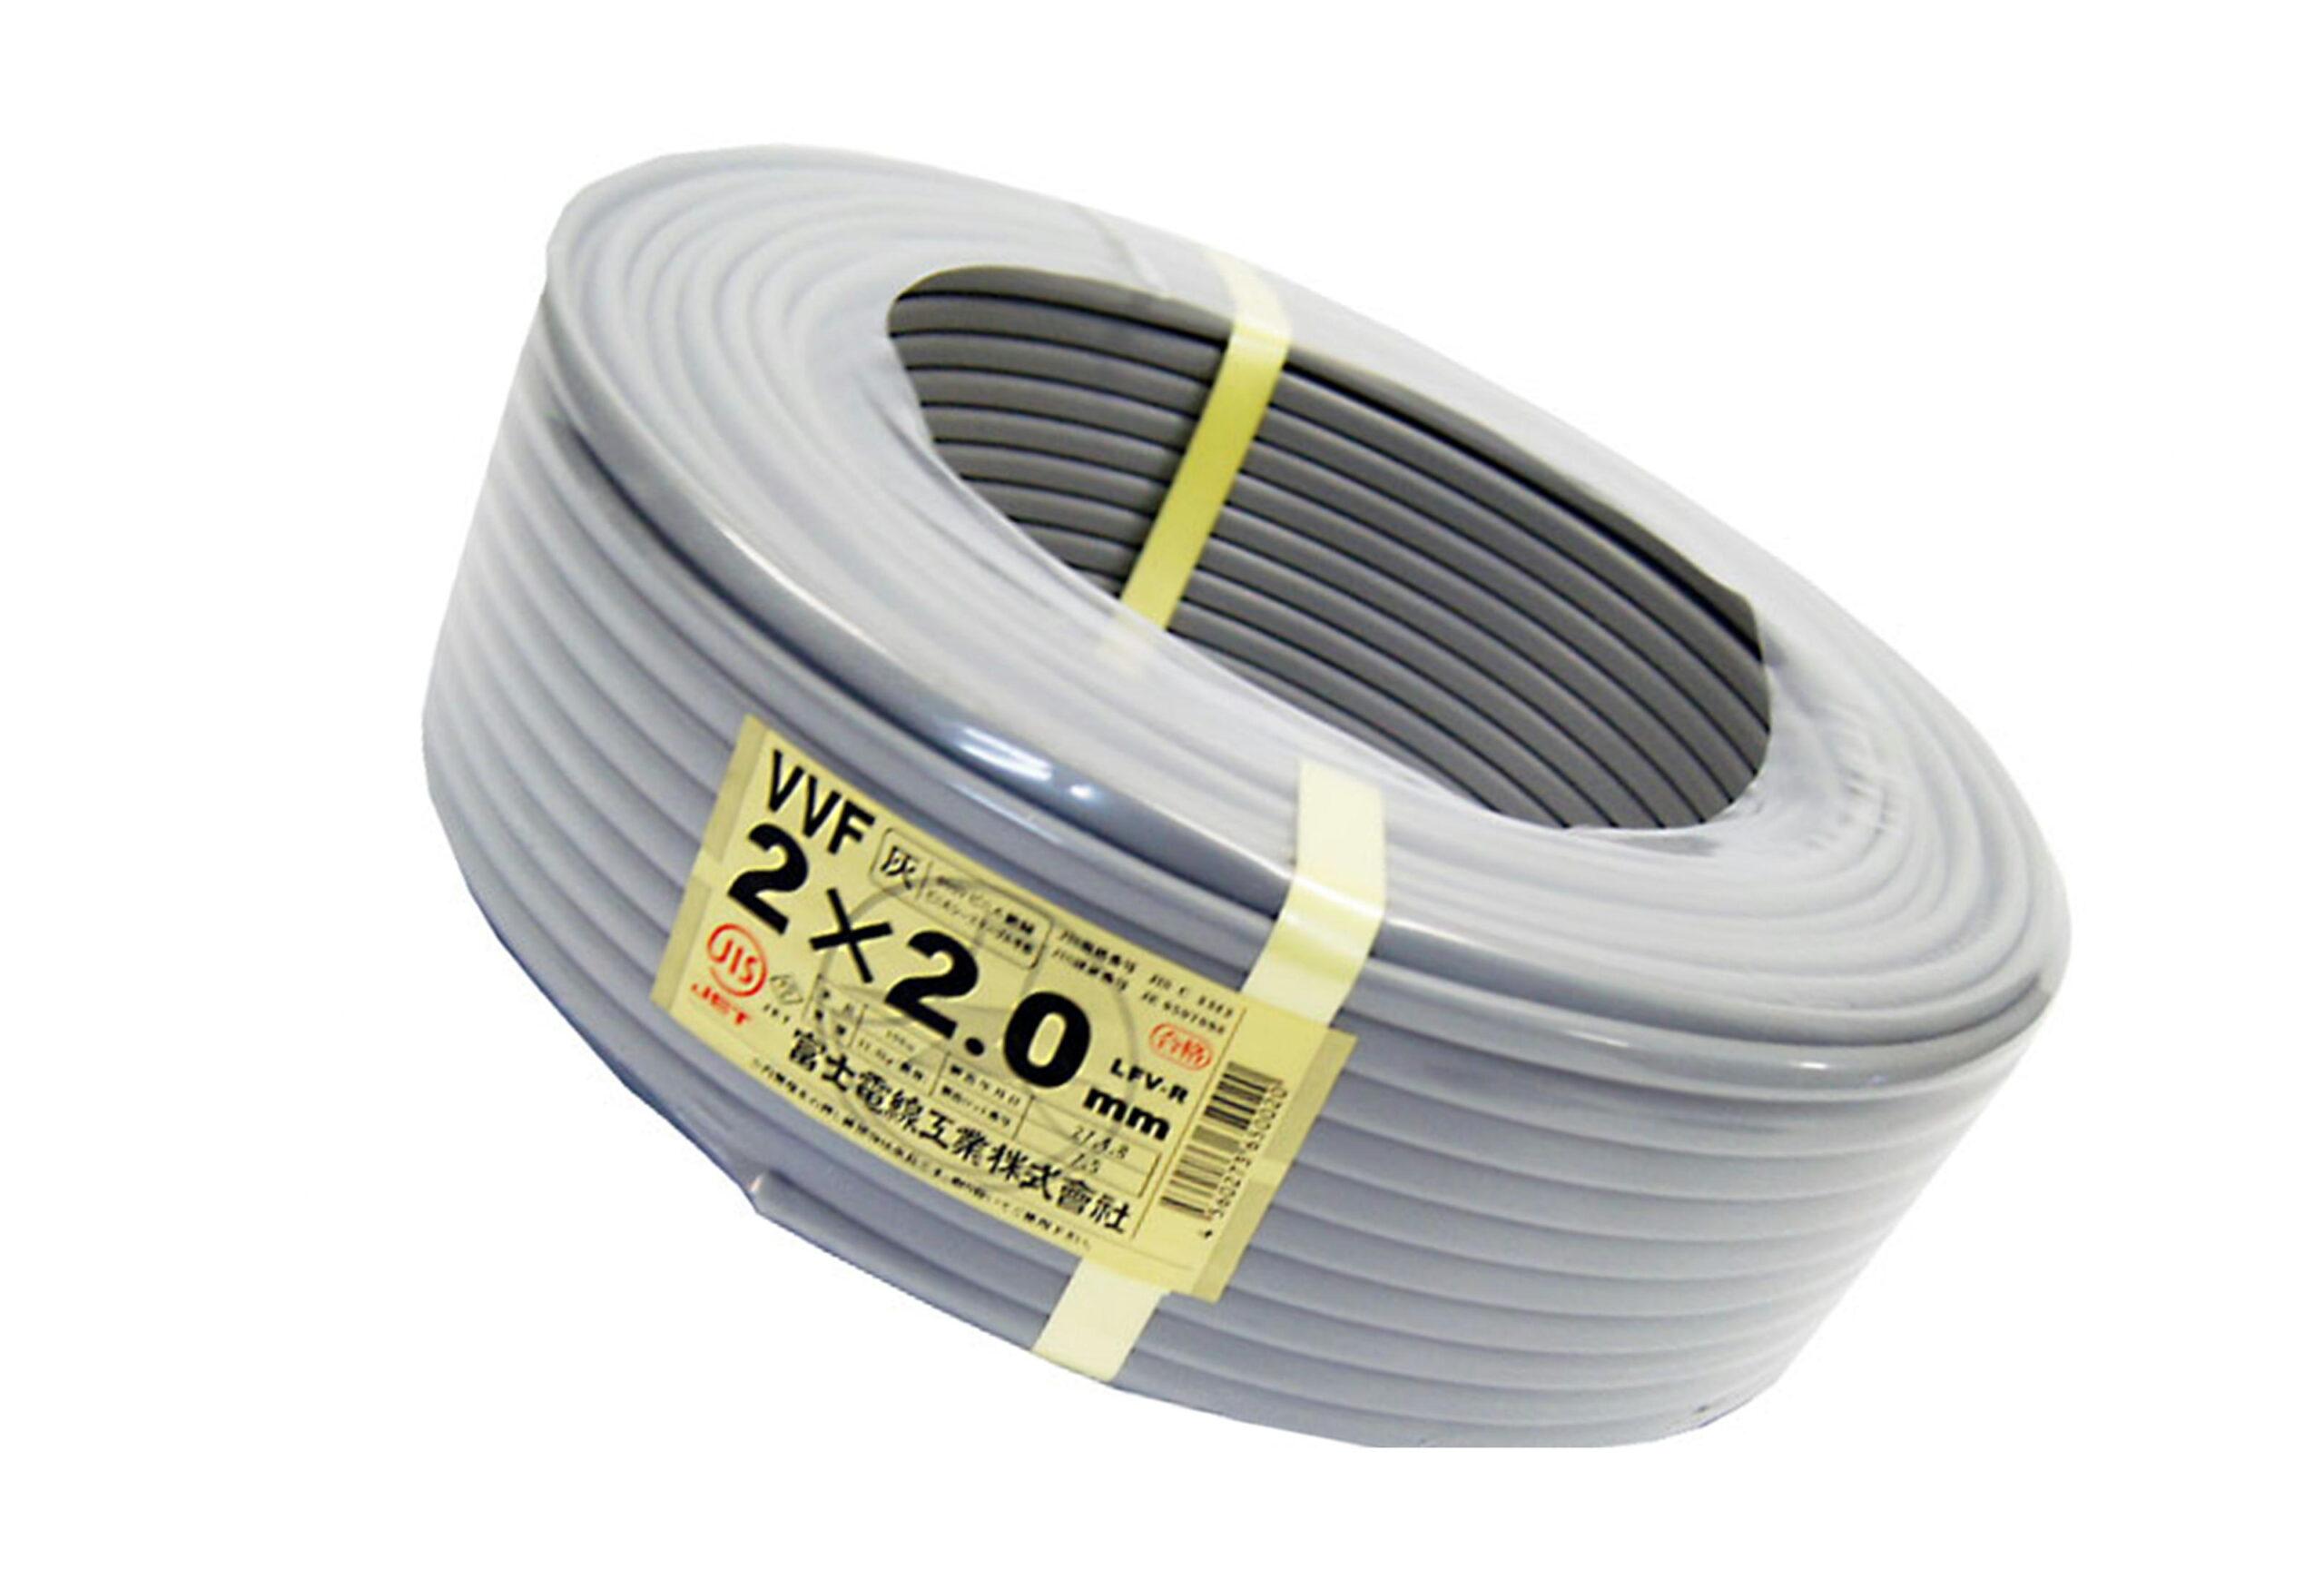 VVFケーブル 2x2.0mm    ネット限定買取価格       地域最高価格で買取ます